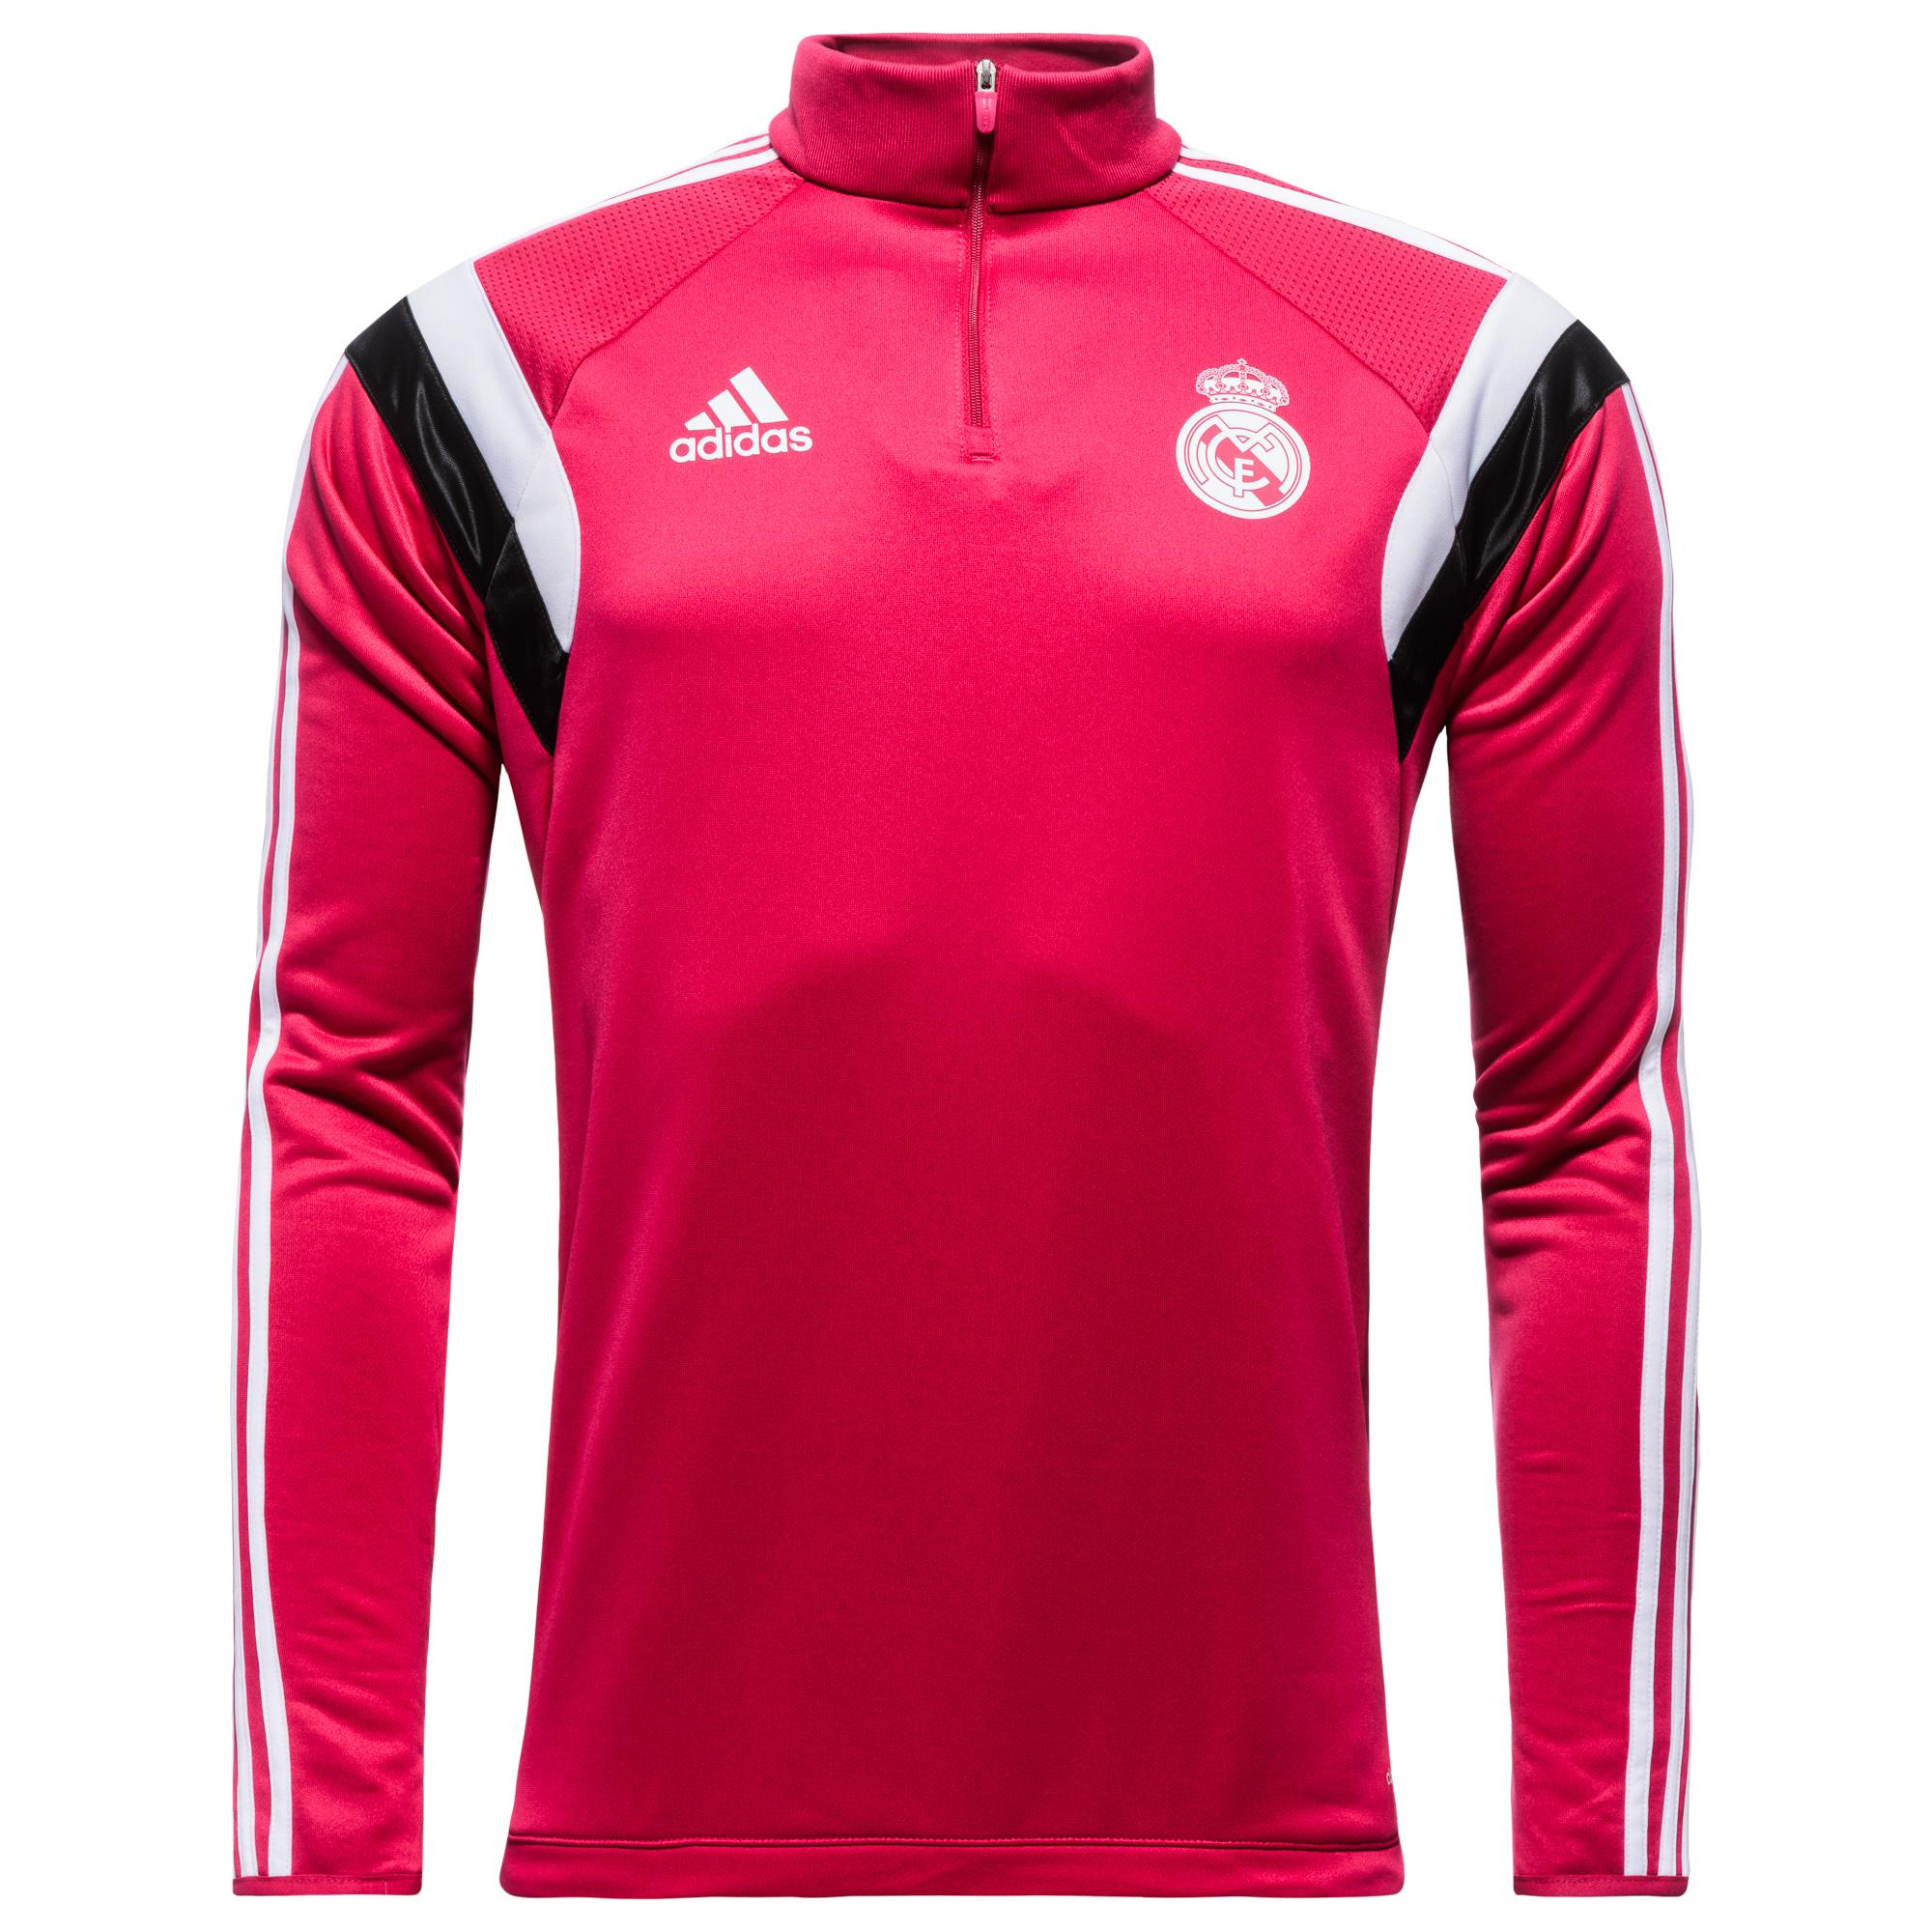 Real Madrid Träningströja Rosa/Svart/Vit